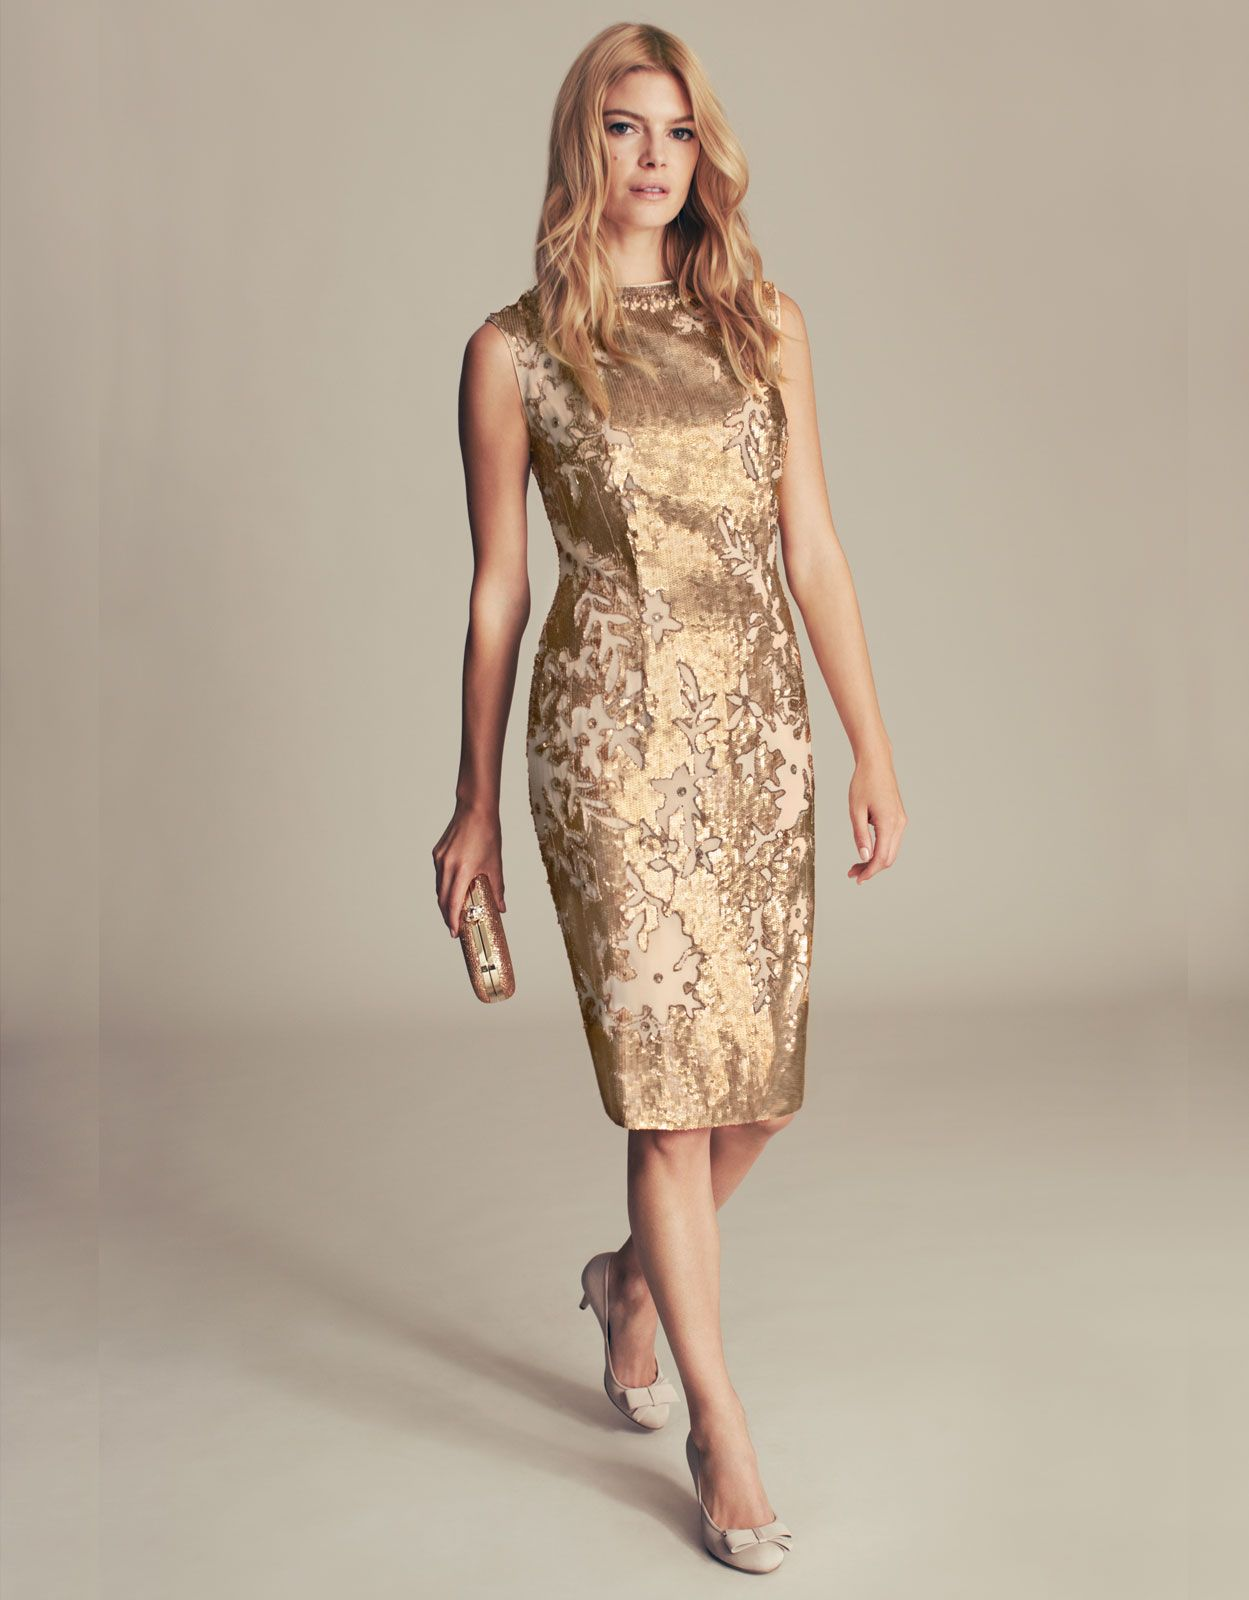 Classic Elegant August Wedding Guest Dress Ideas You Will Love